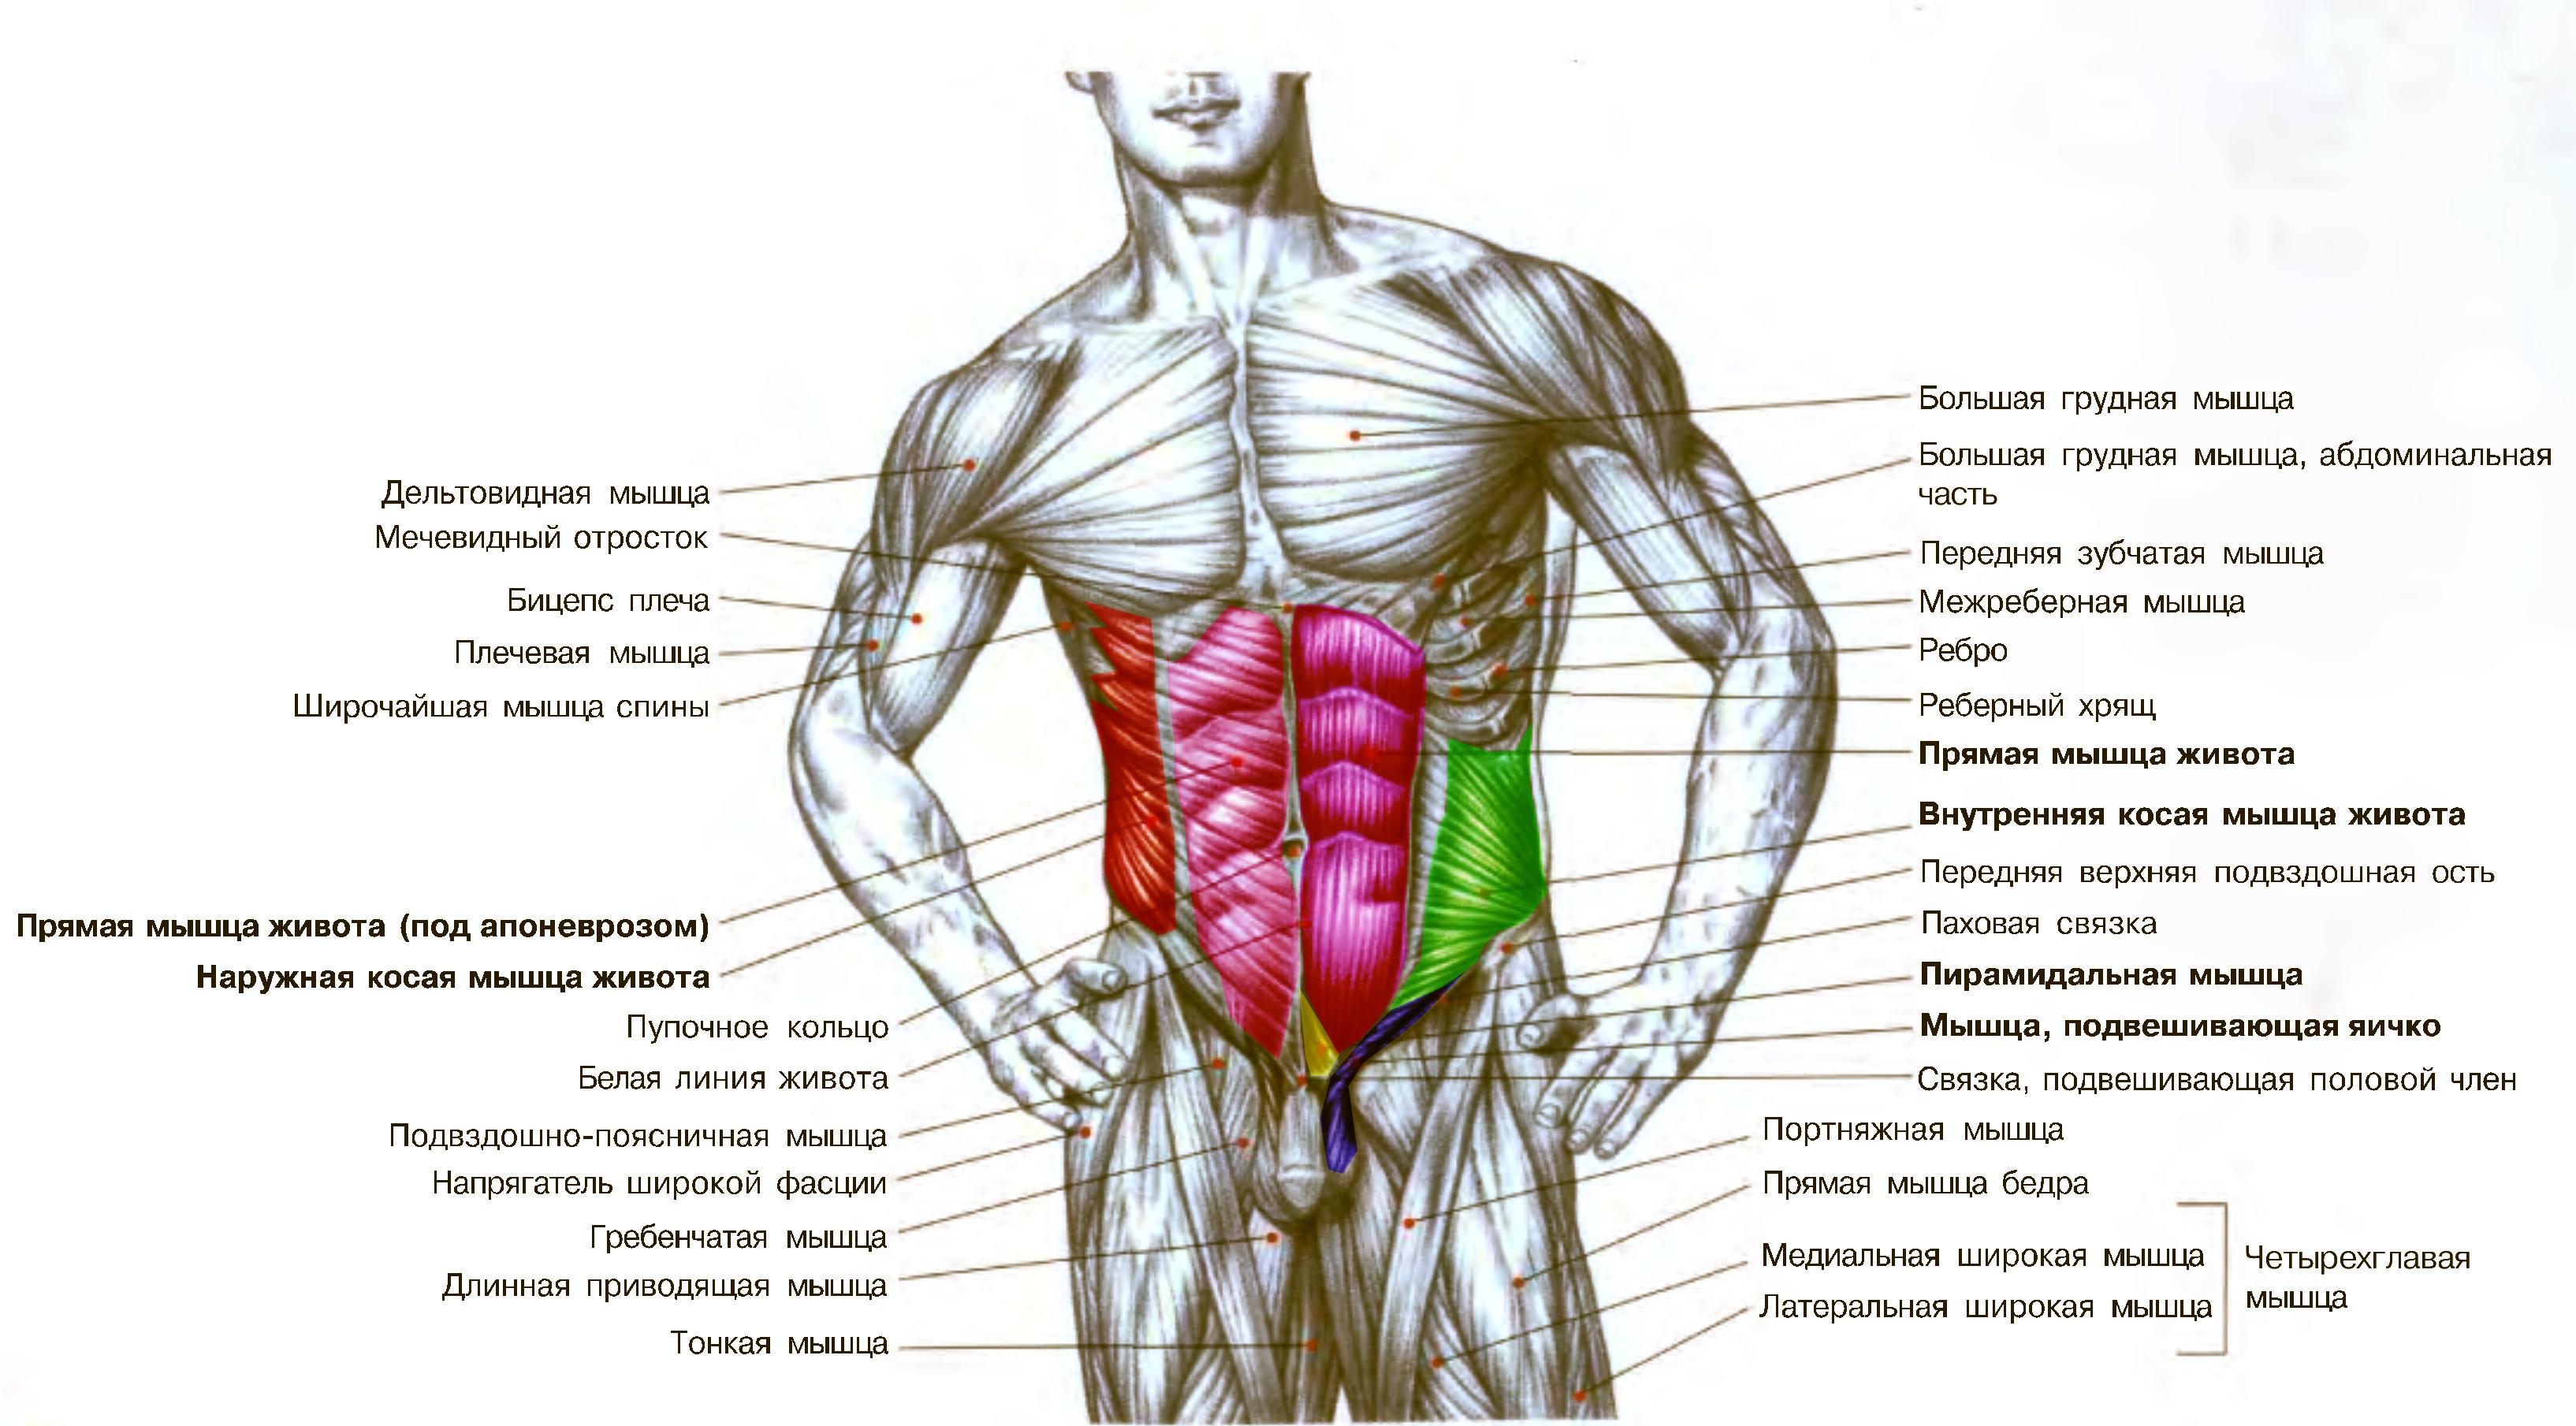 Схема мышц тела человека / ©Flickr